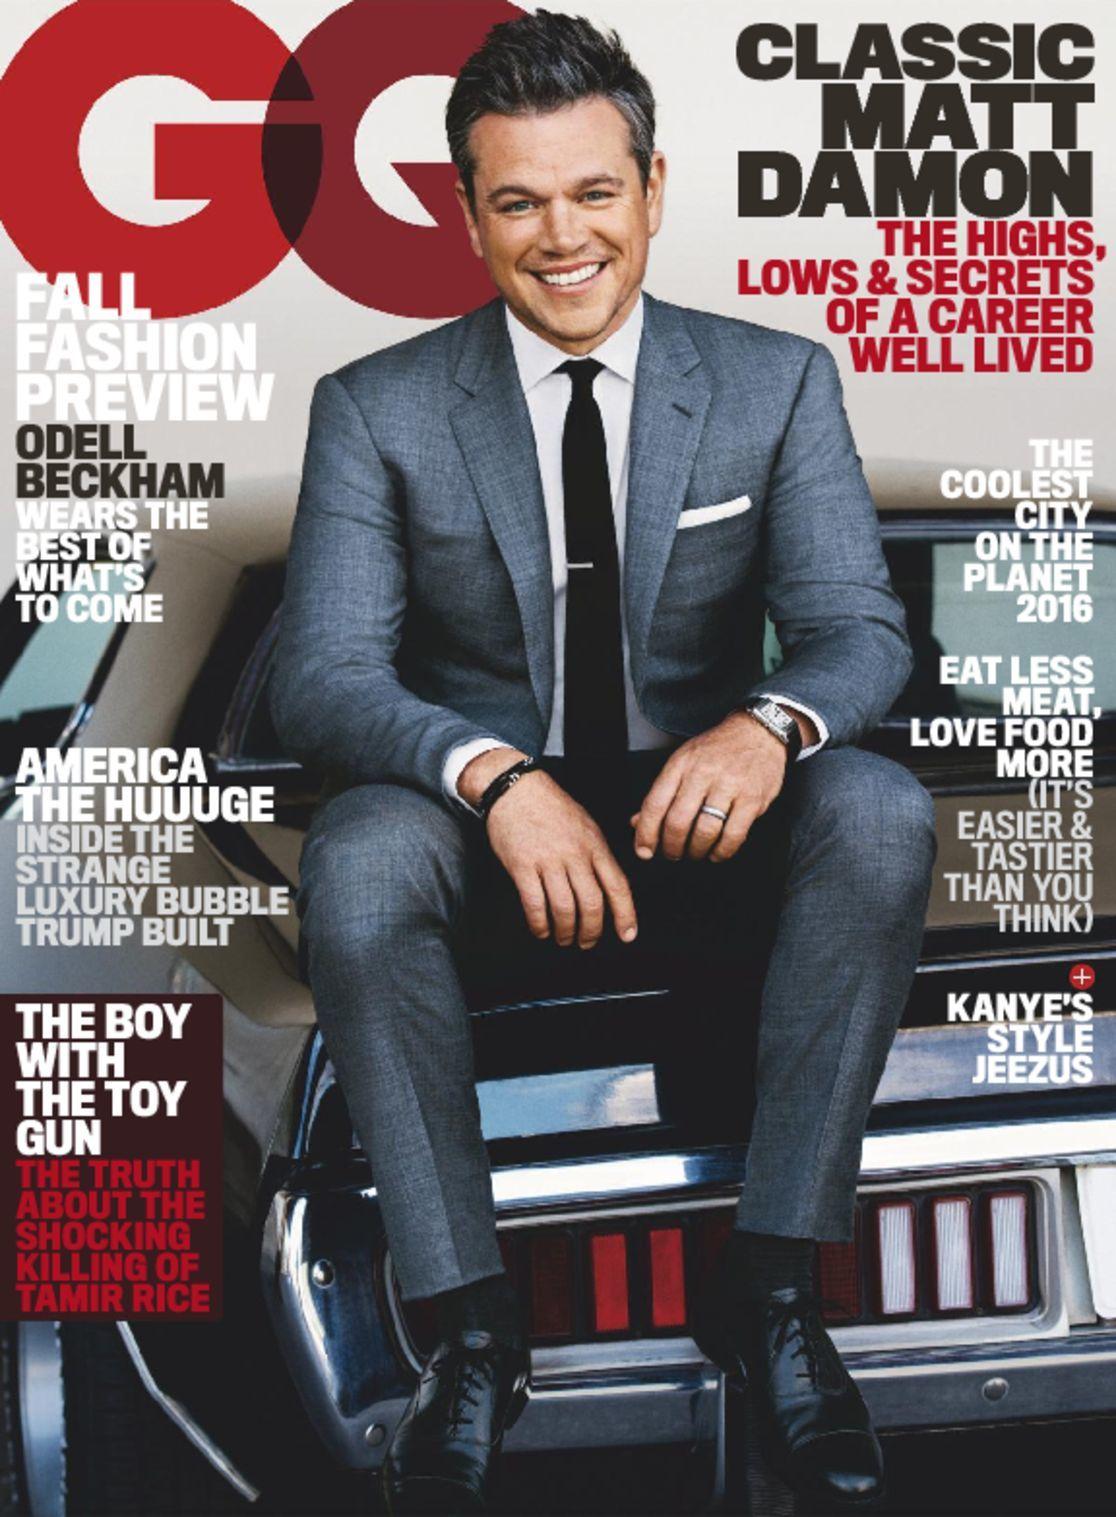 GQ Gentlemens Quarterly Magazine Subscription